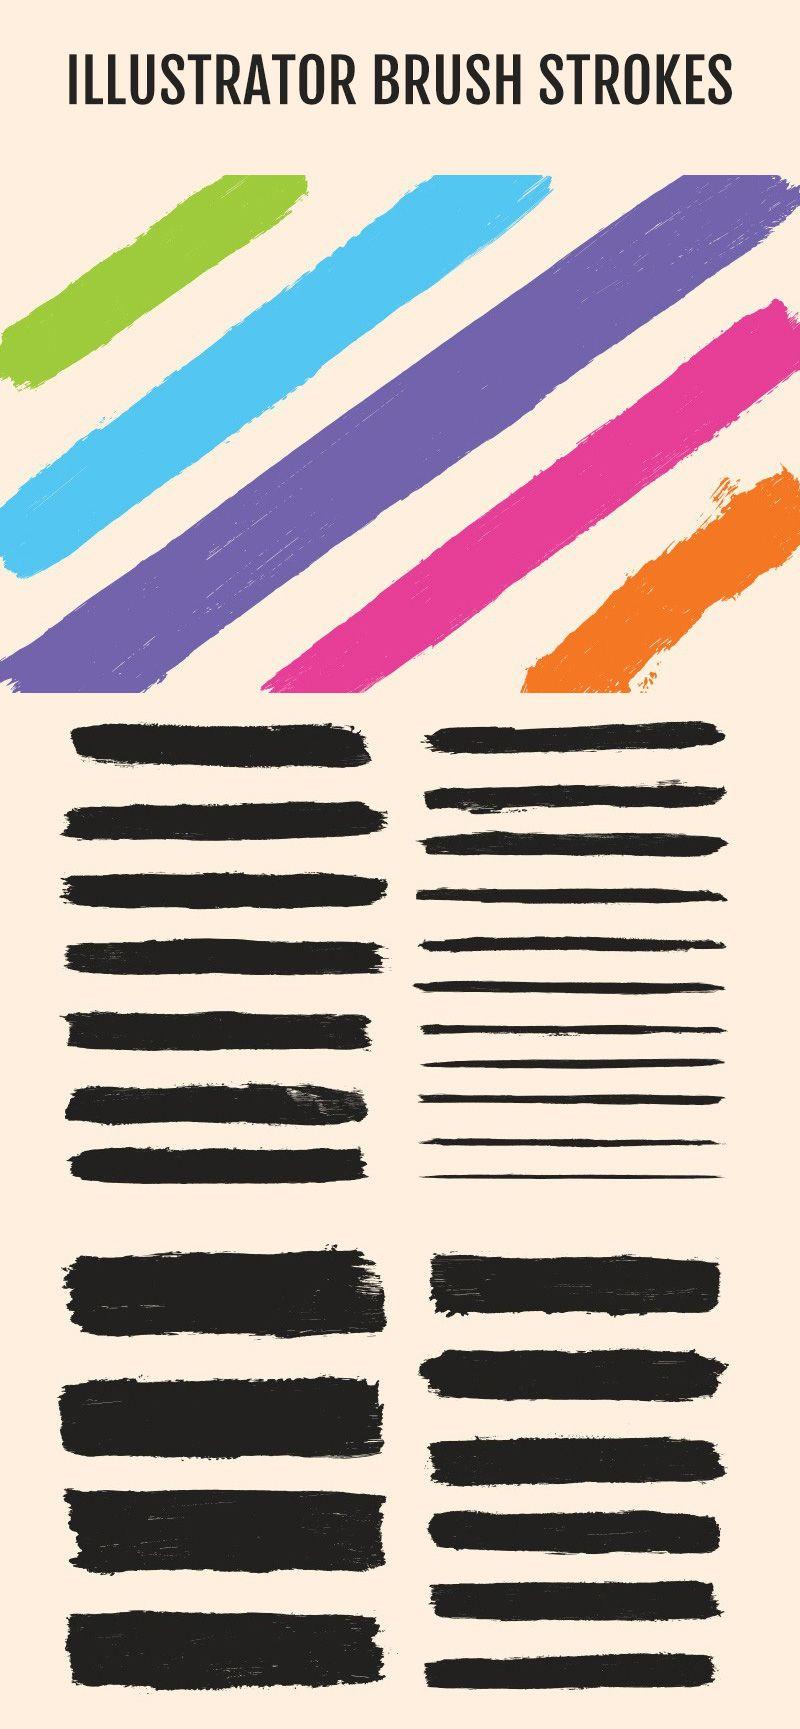 Illustrator Brush Strokes Brush strokes, Illustration